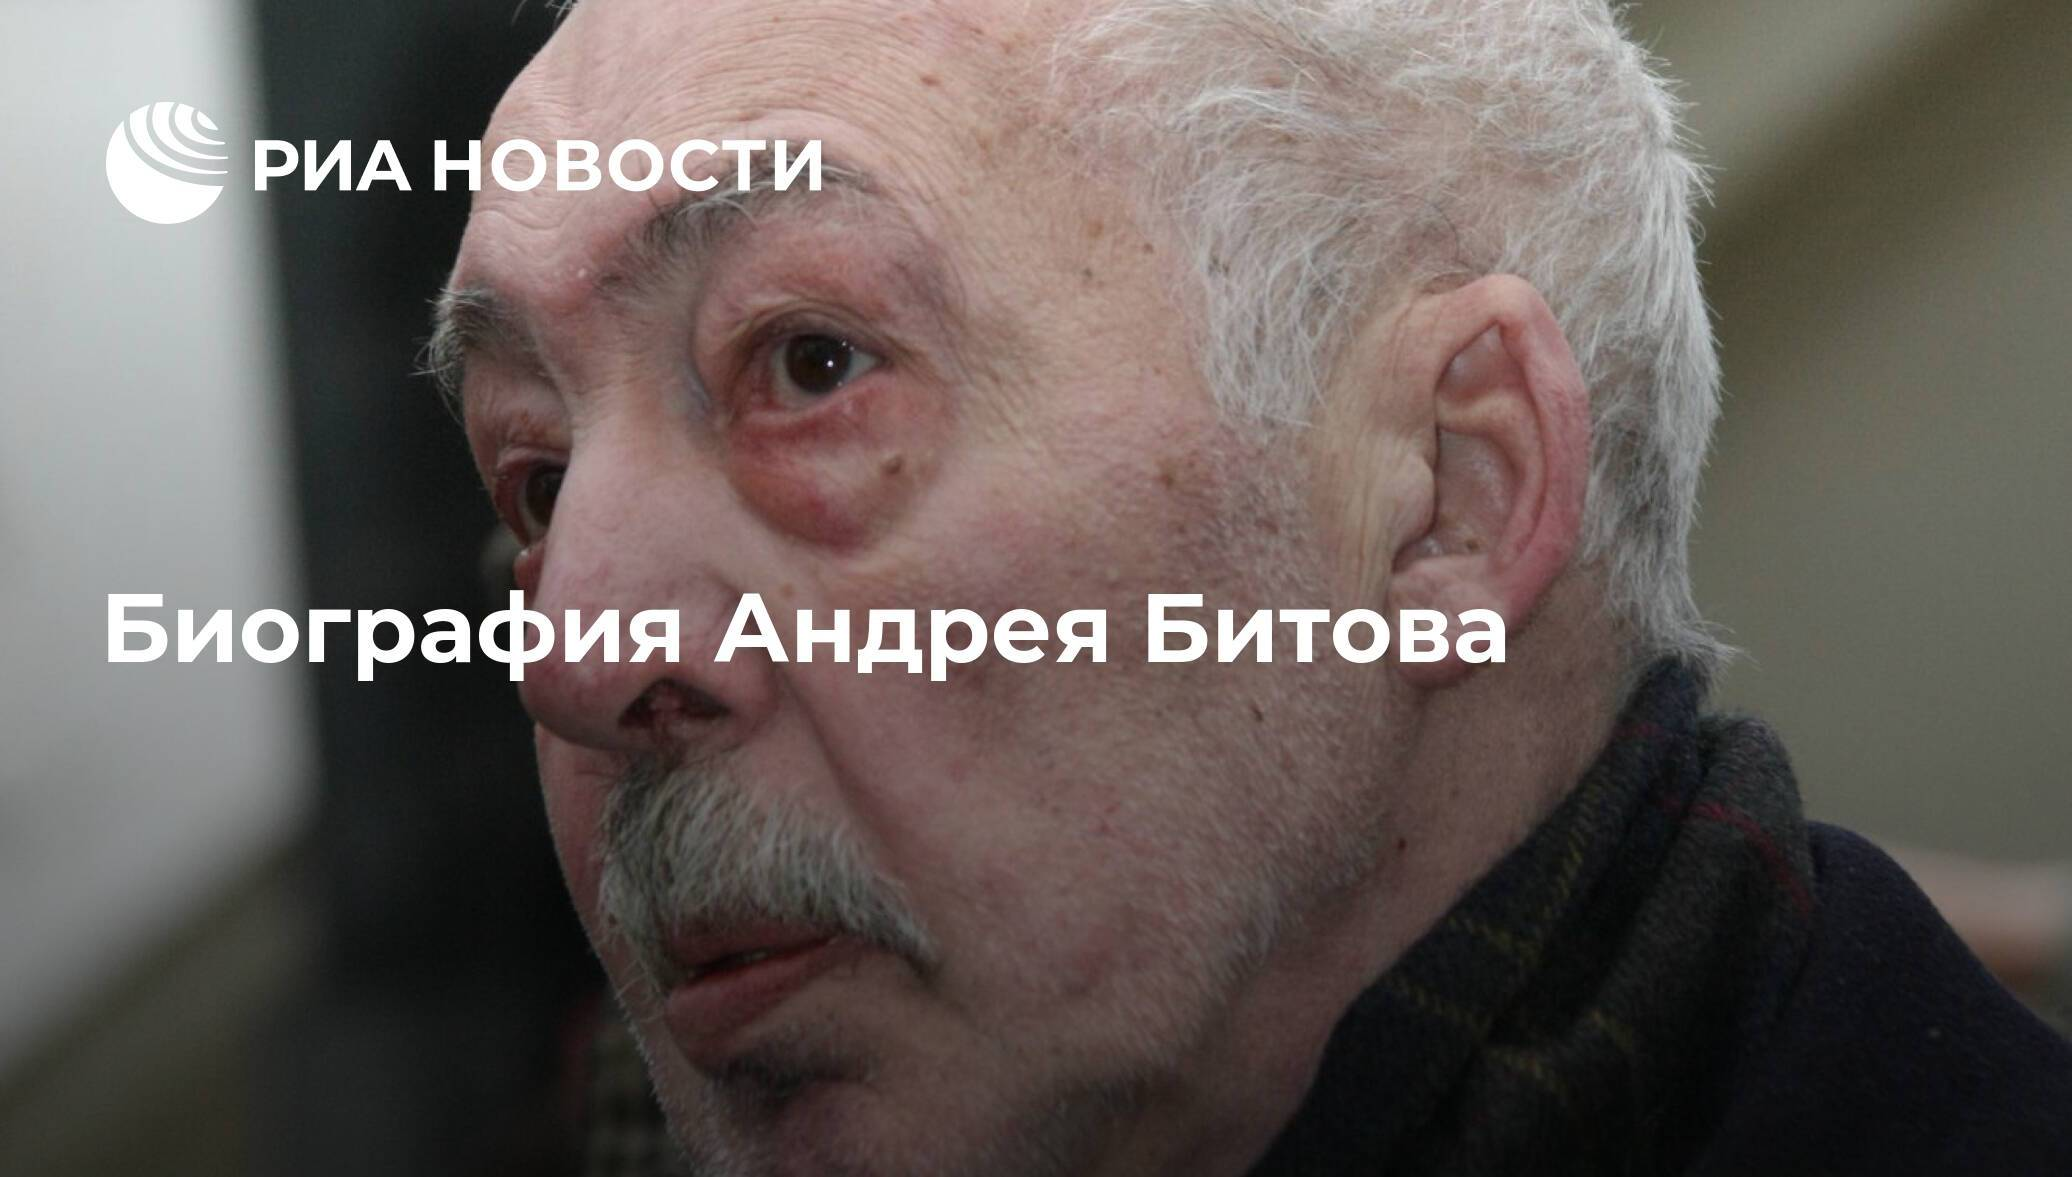 Жизнь и творчество писателя андрея битова. реферат. литература. 2013-04-28